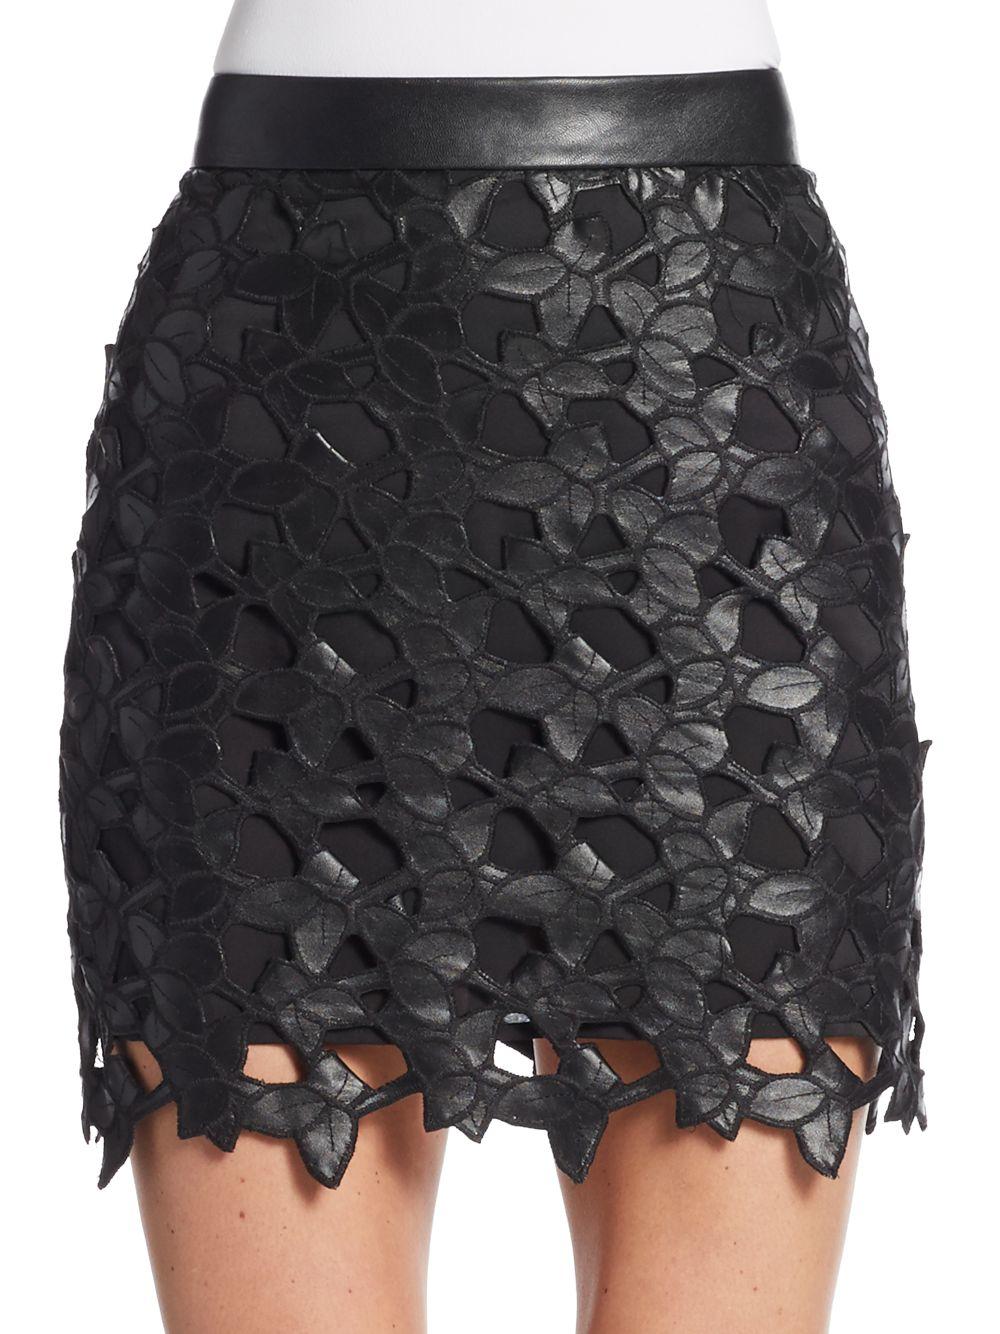 Sam edelman Emma Faux Leather-lace Mini Skirt in Black | Lyst